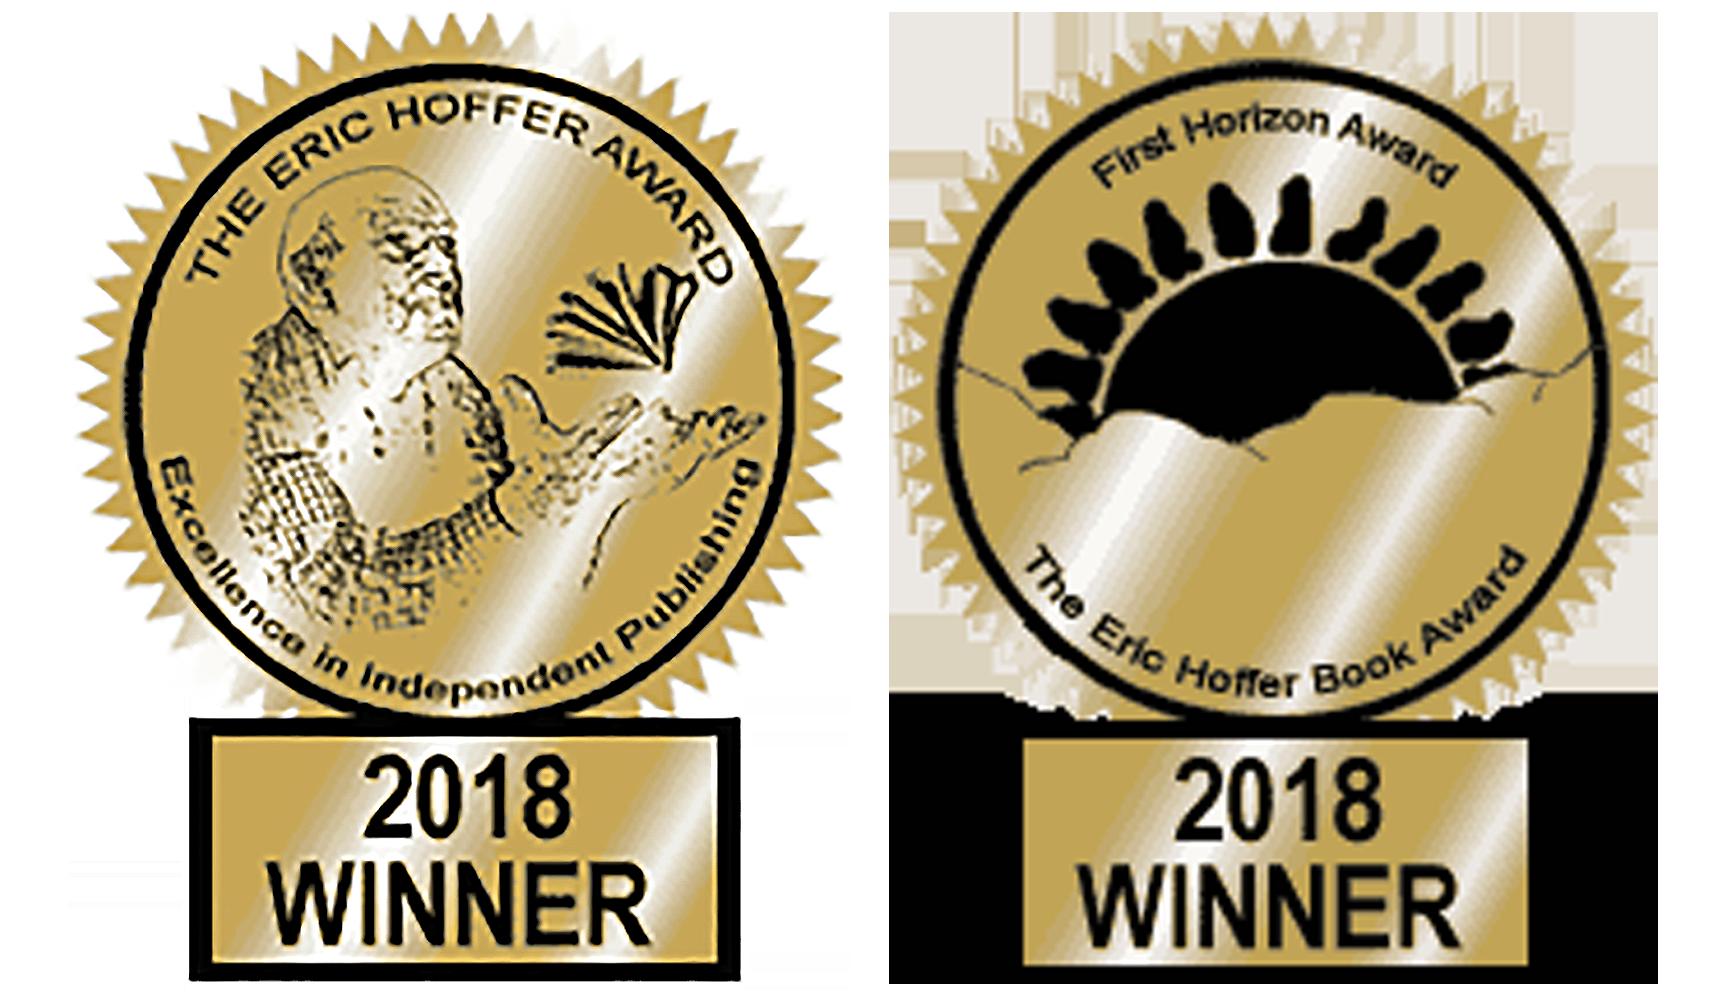 Hoffer Award Winner Seals Both.png